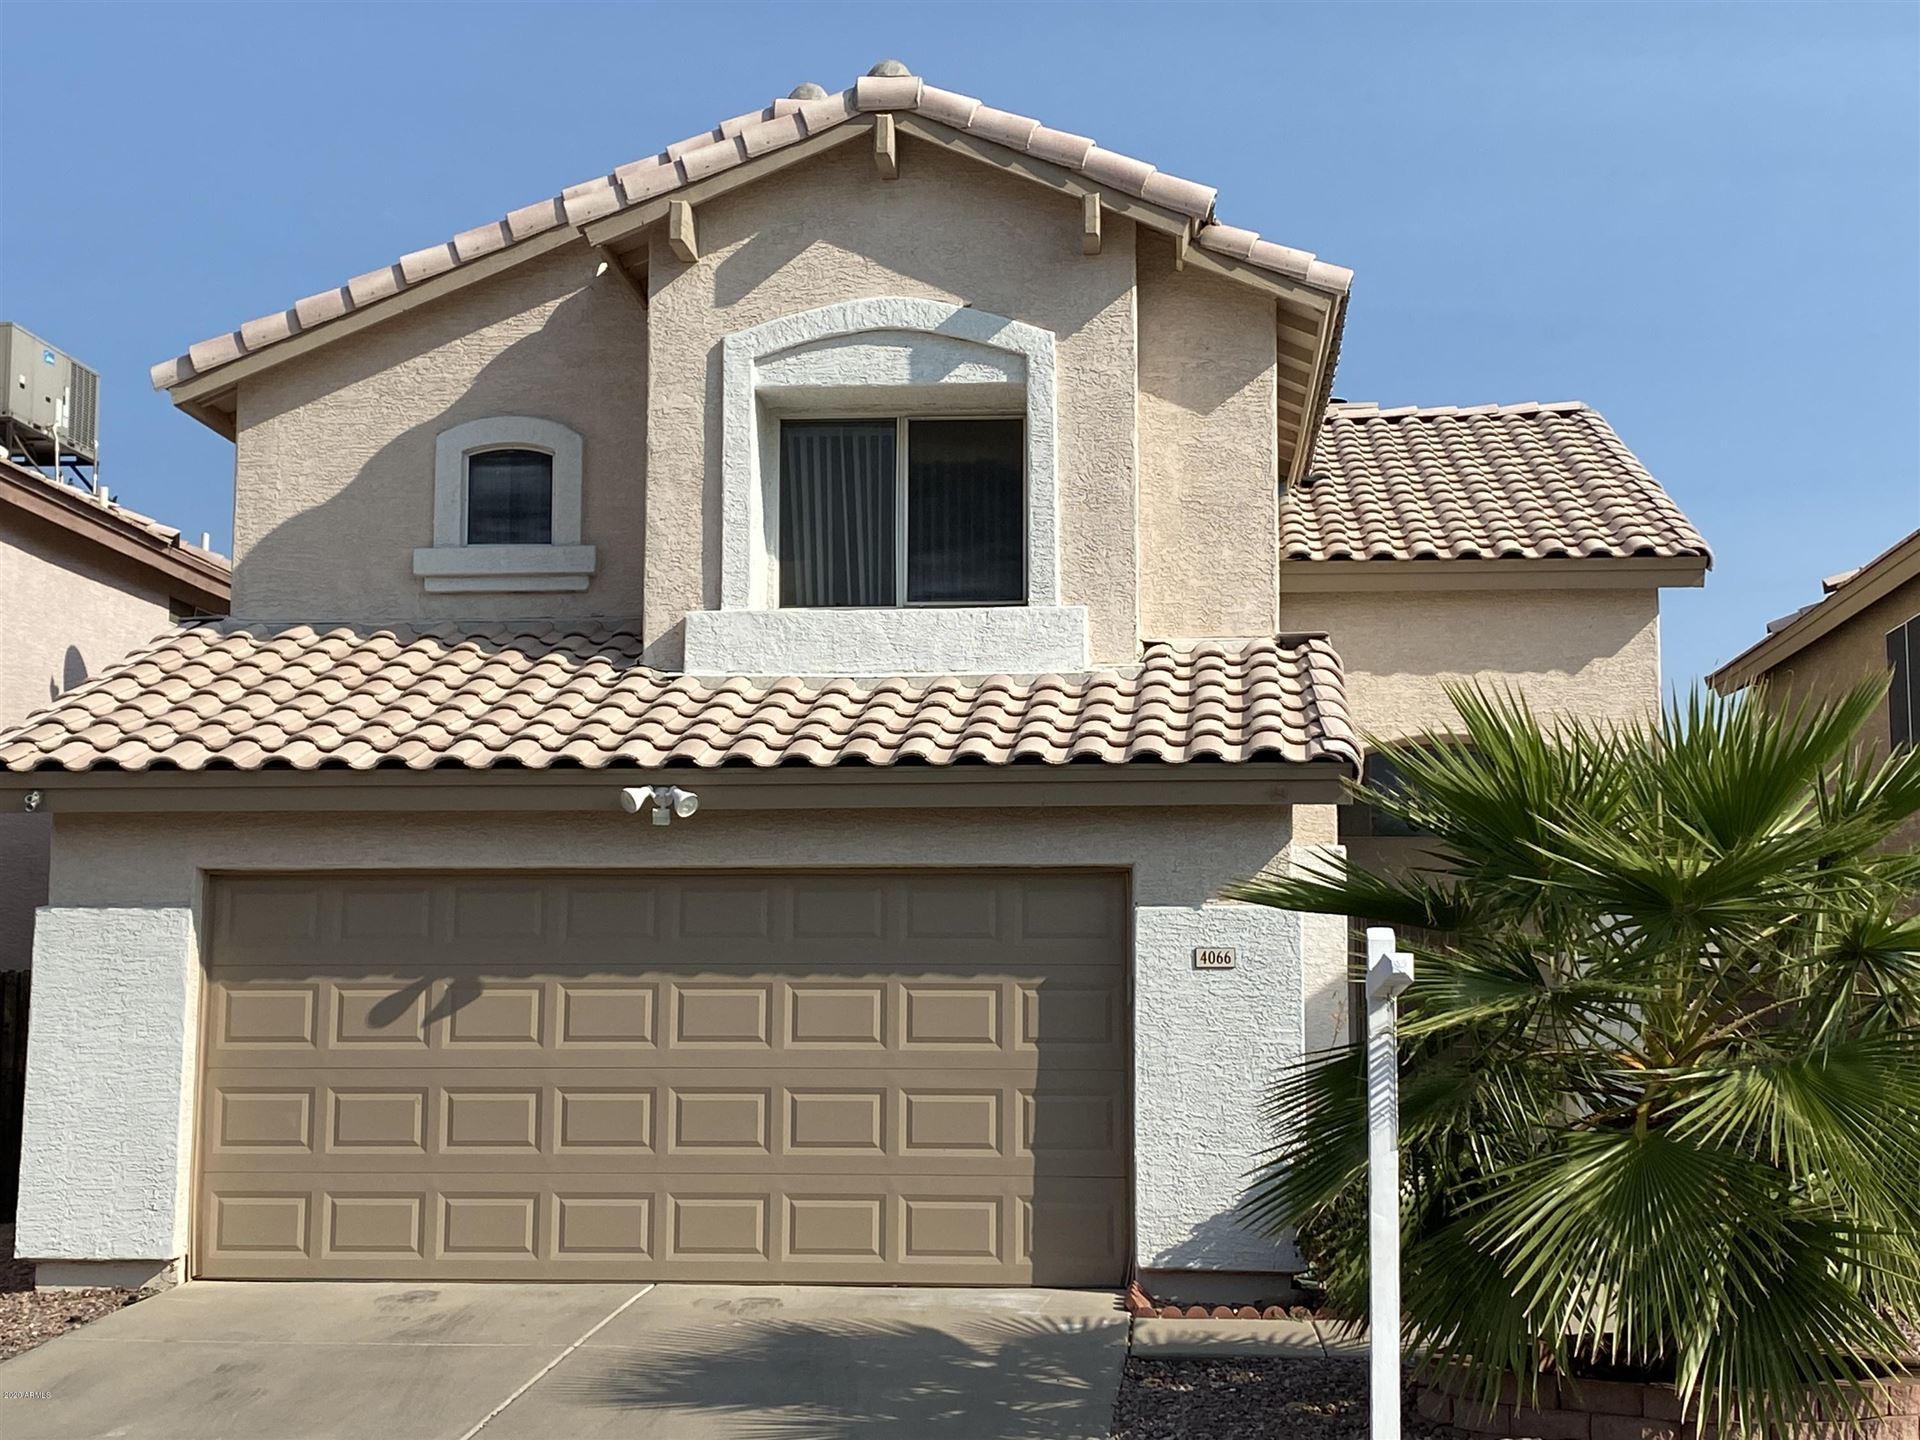 4066 E COOLBROOK Avenue, Phoenix, AZ 85032 - MLS#: 6125054